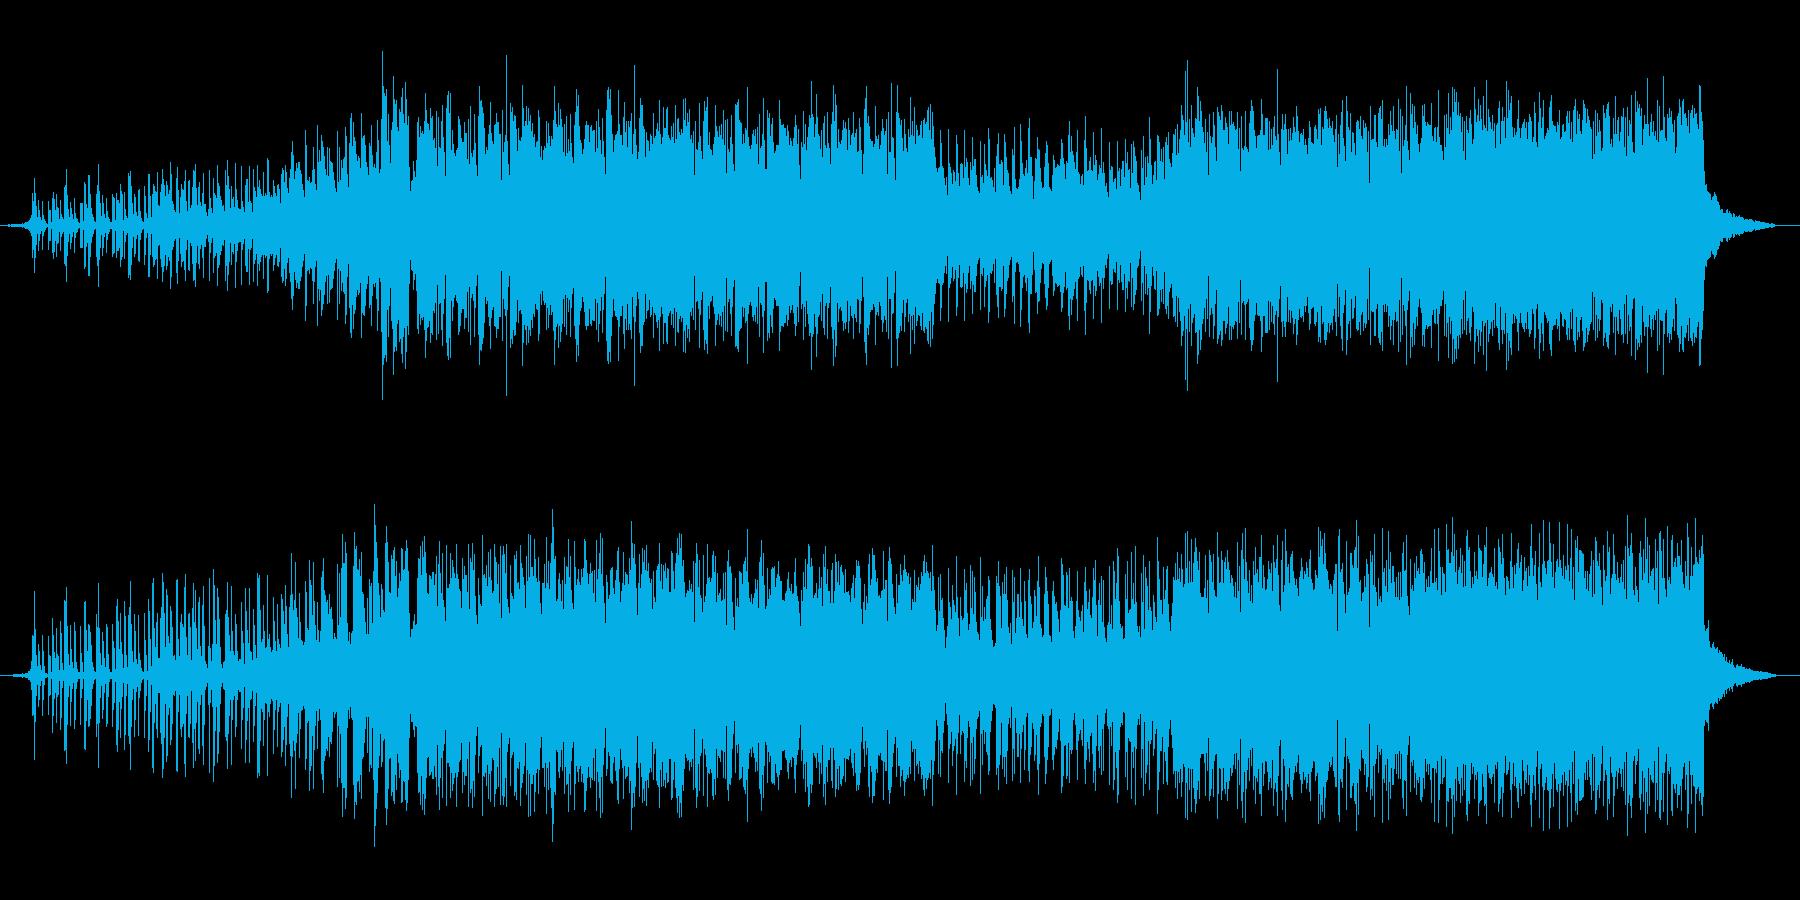 electronic pop、明るいの再生済みの波形